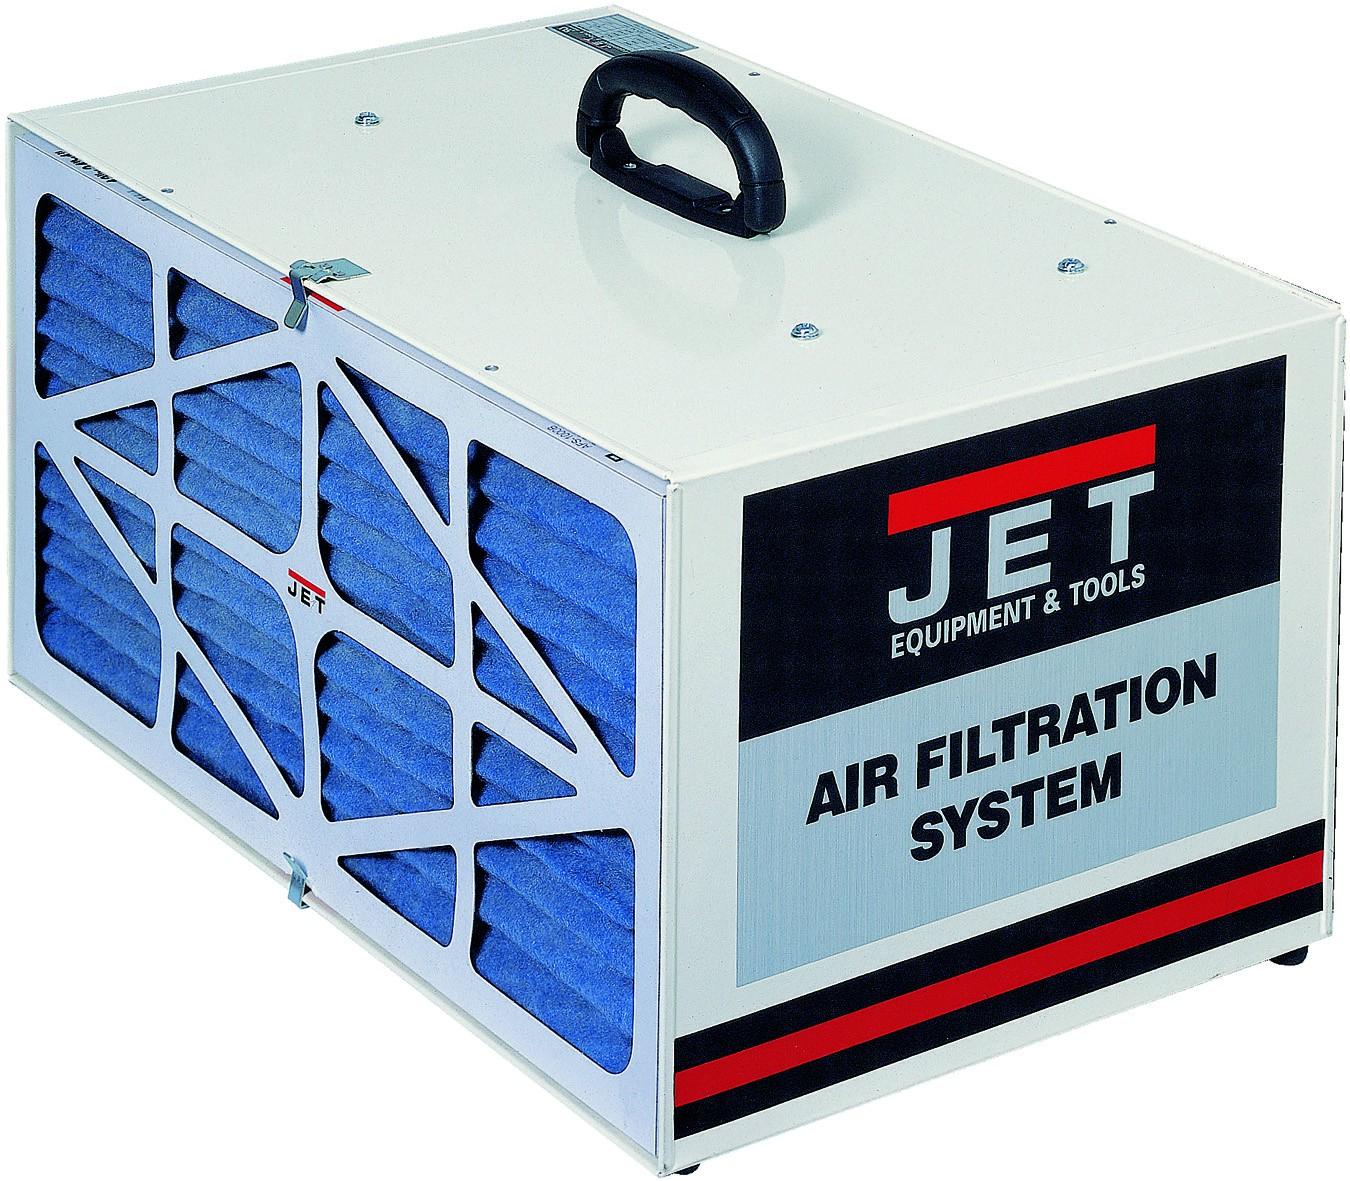 JET AFS-500 230V Système de filtration d'air